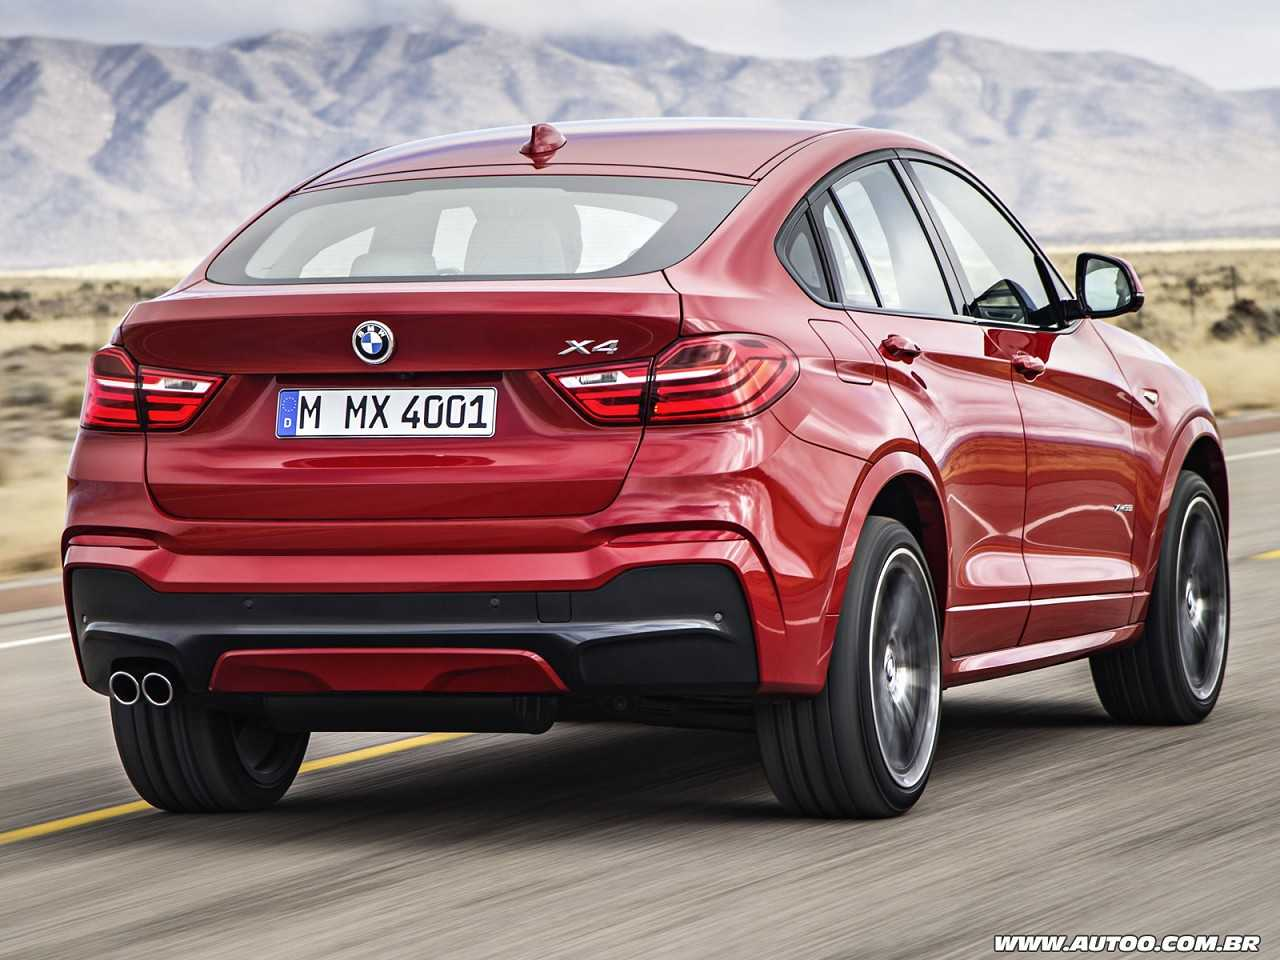 BMWX4 2014 - ângulo traseiro